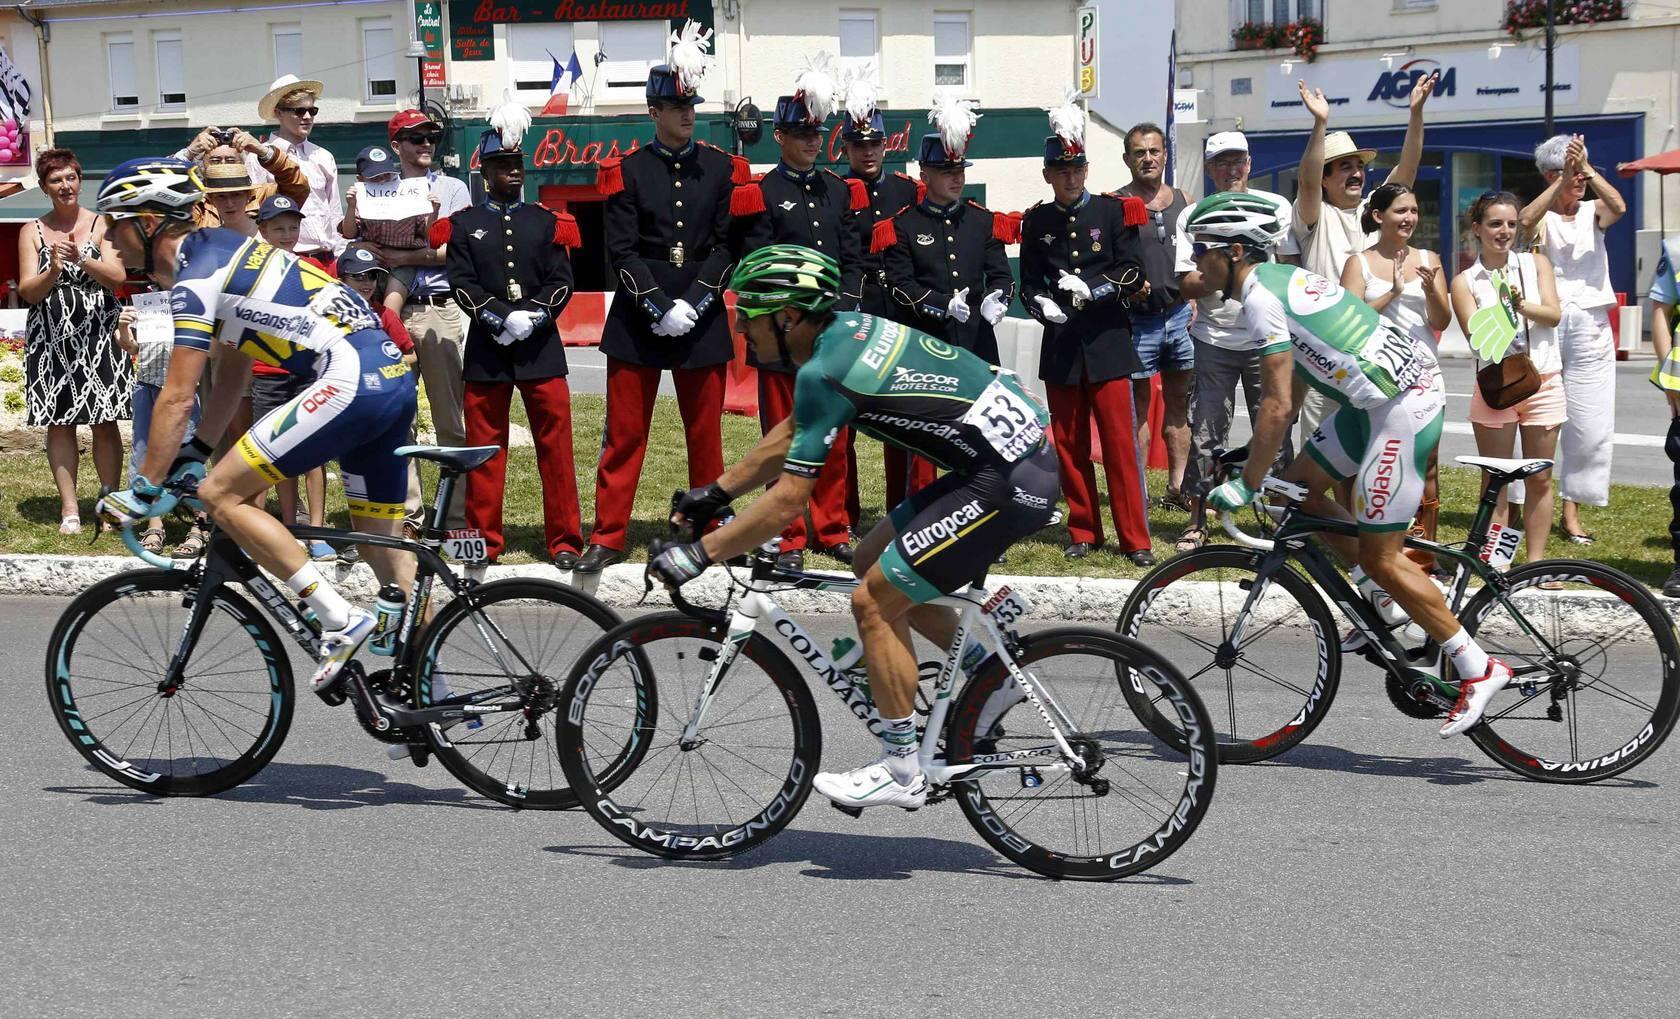 Kittel gana la décima etapa en un accidentado esprín